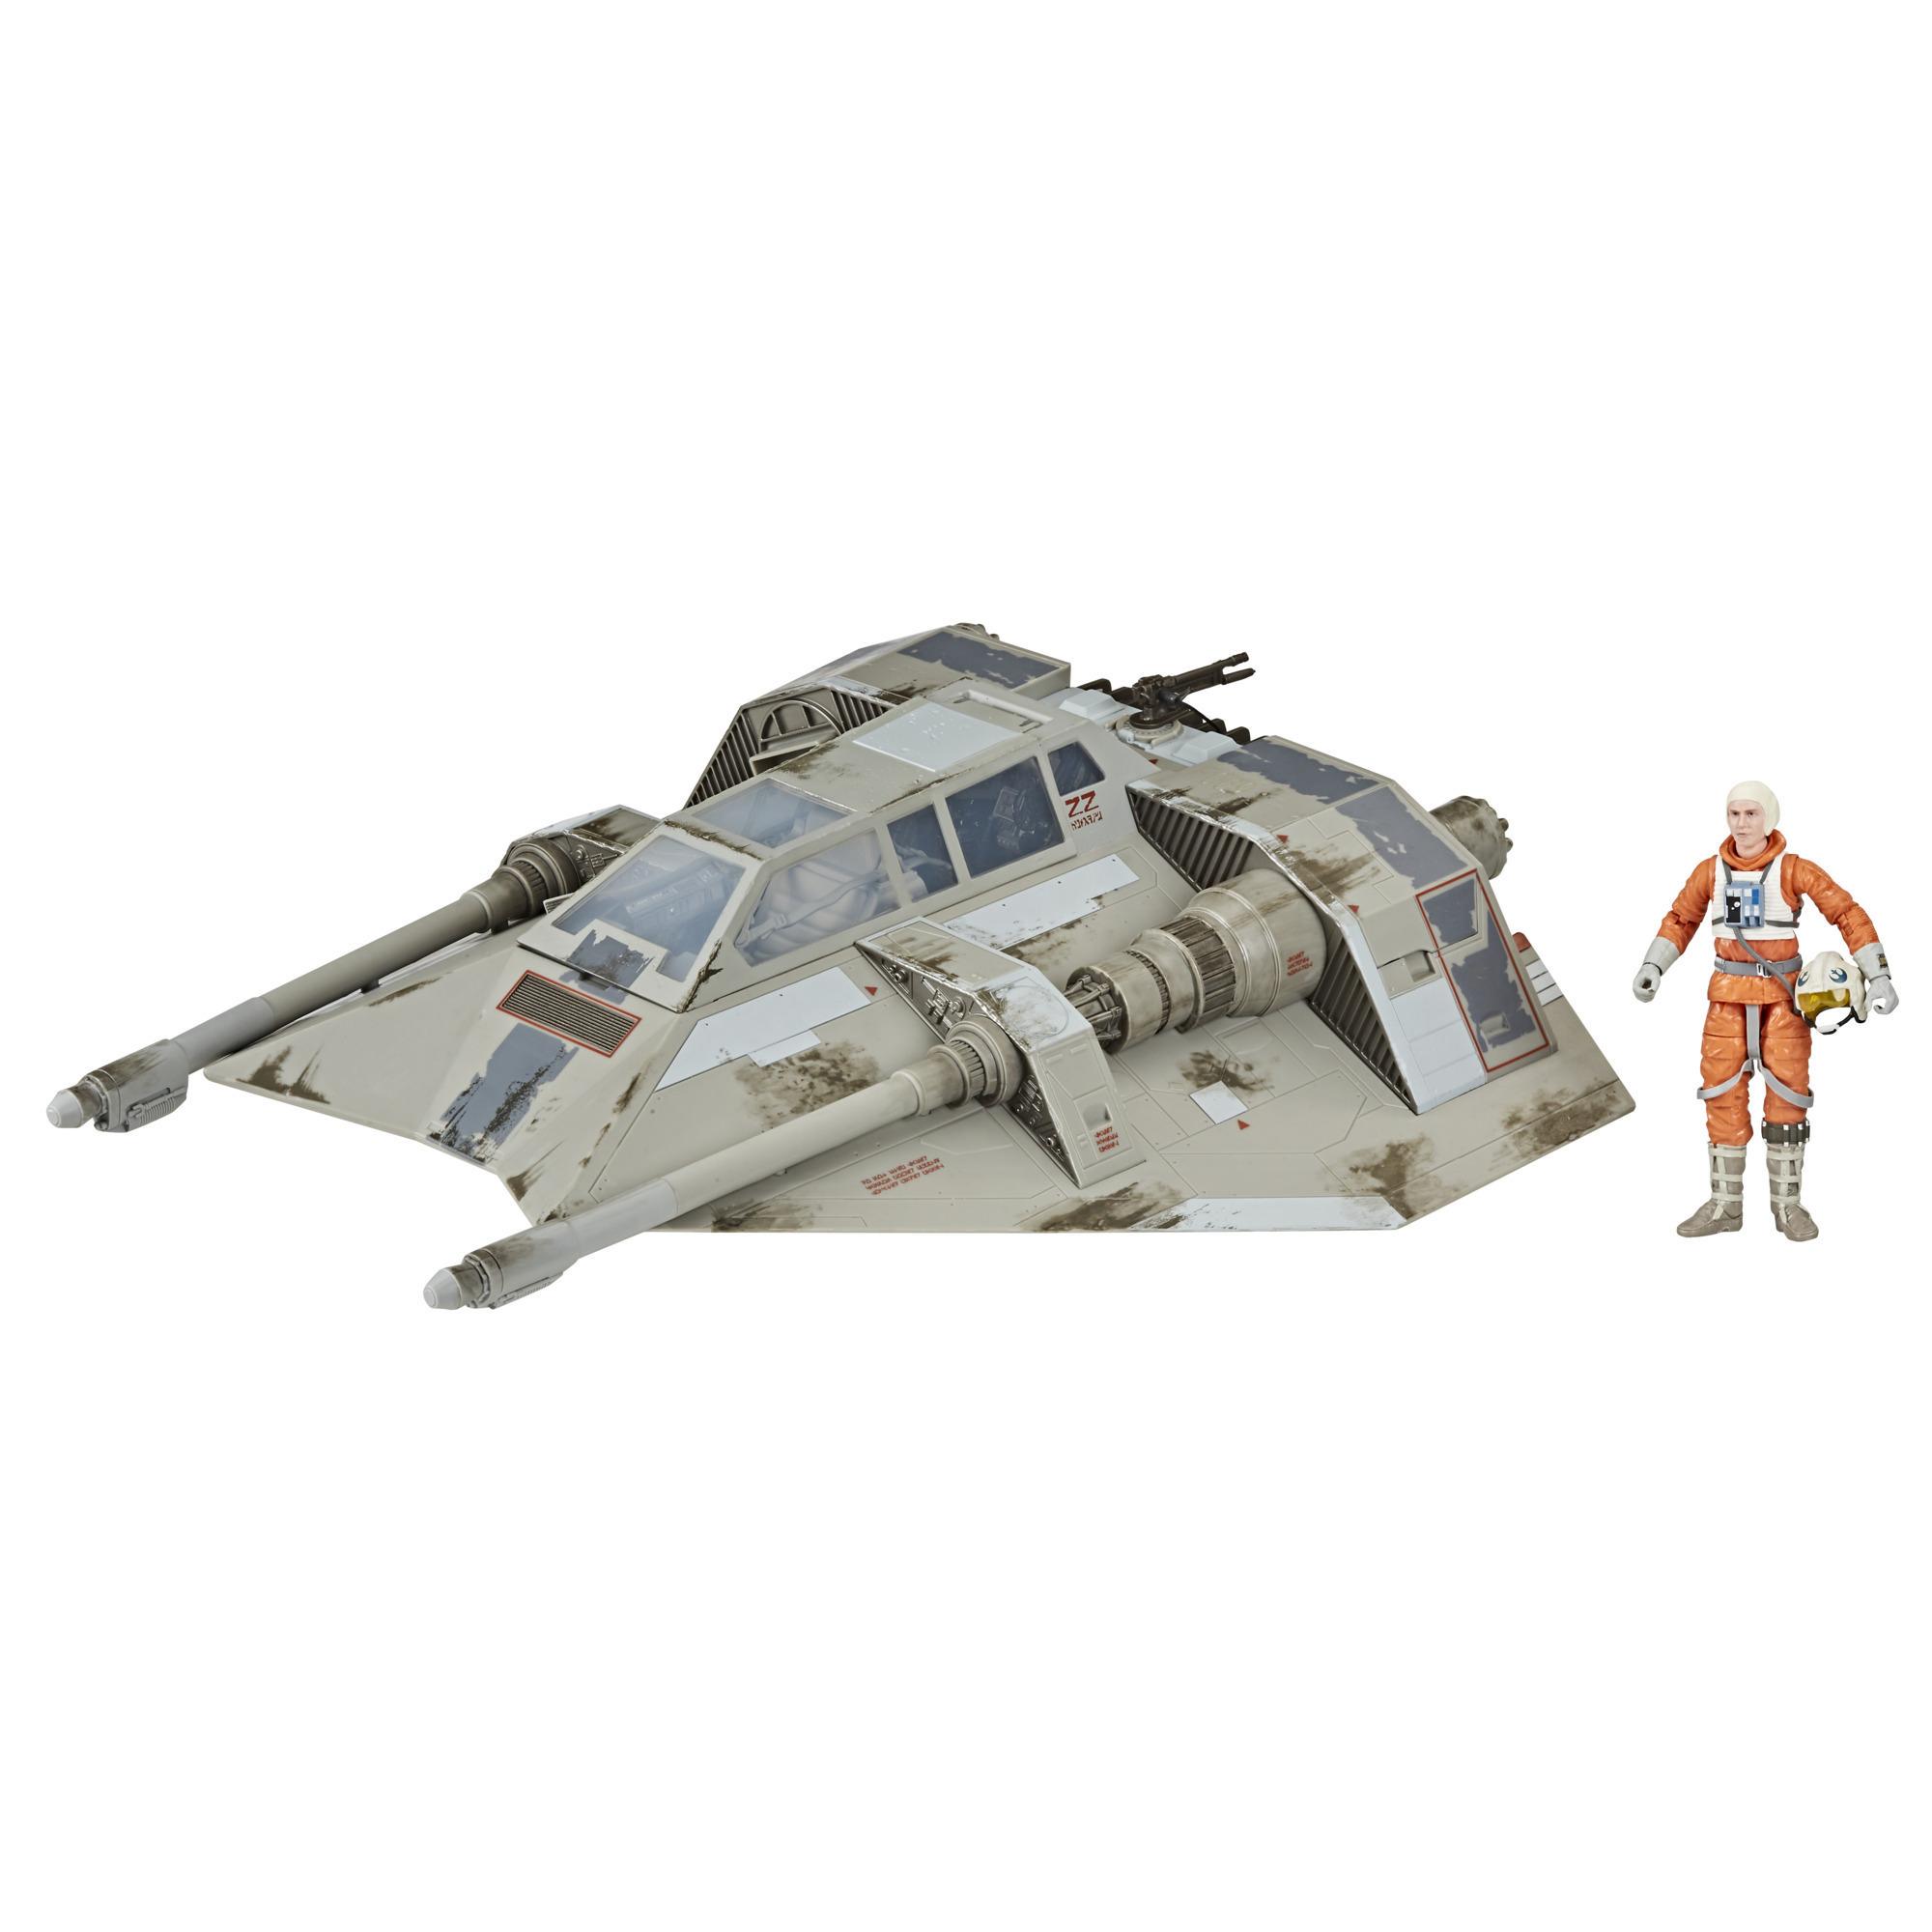 Star Wars The Black Series Snowspeeder Vehicle, Dak Ralter Figure, 6-Inch-Scale Star Wars: The Empire Strikes Back Toys